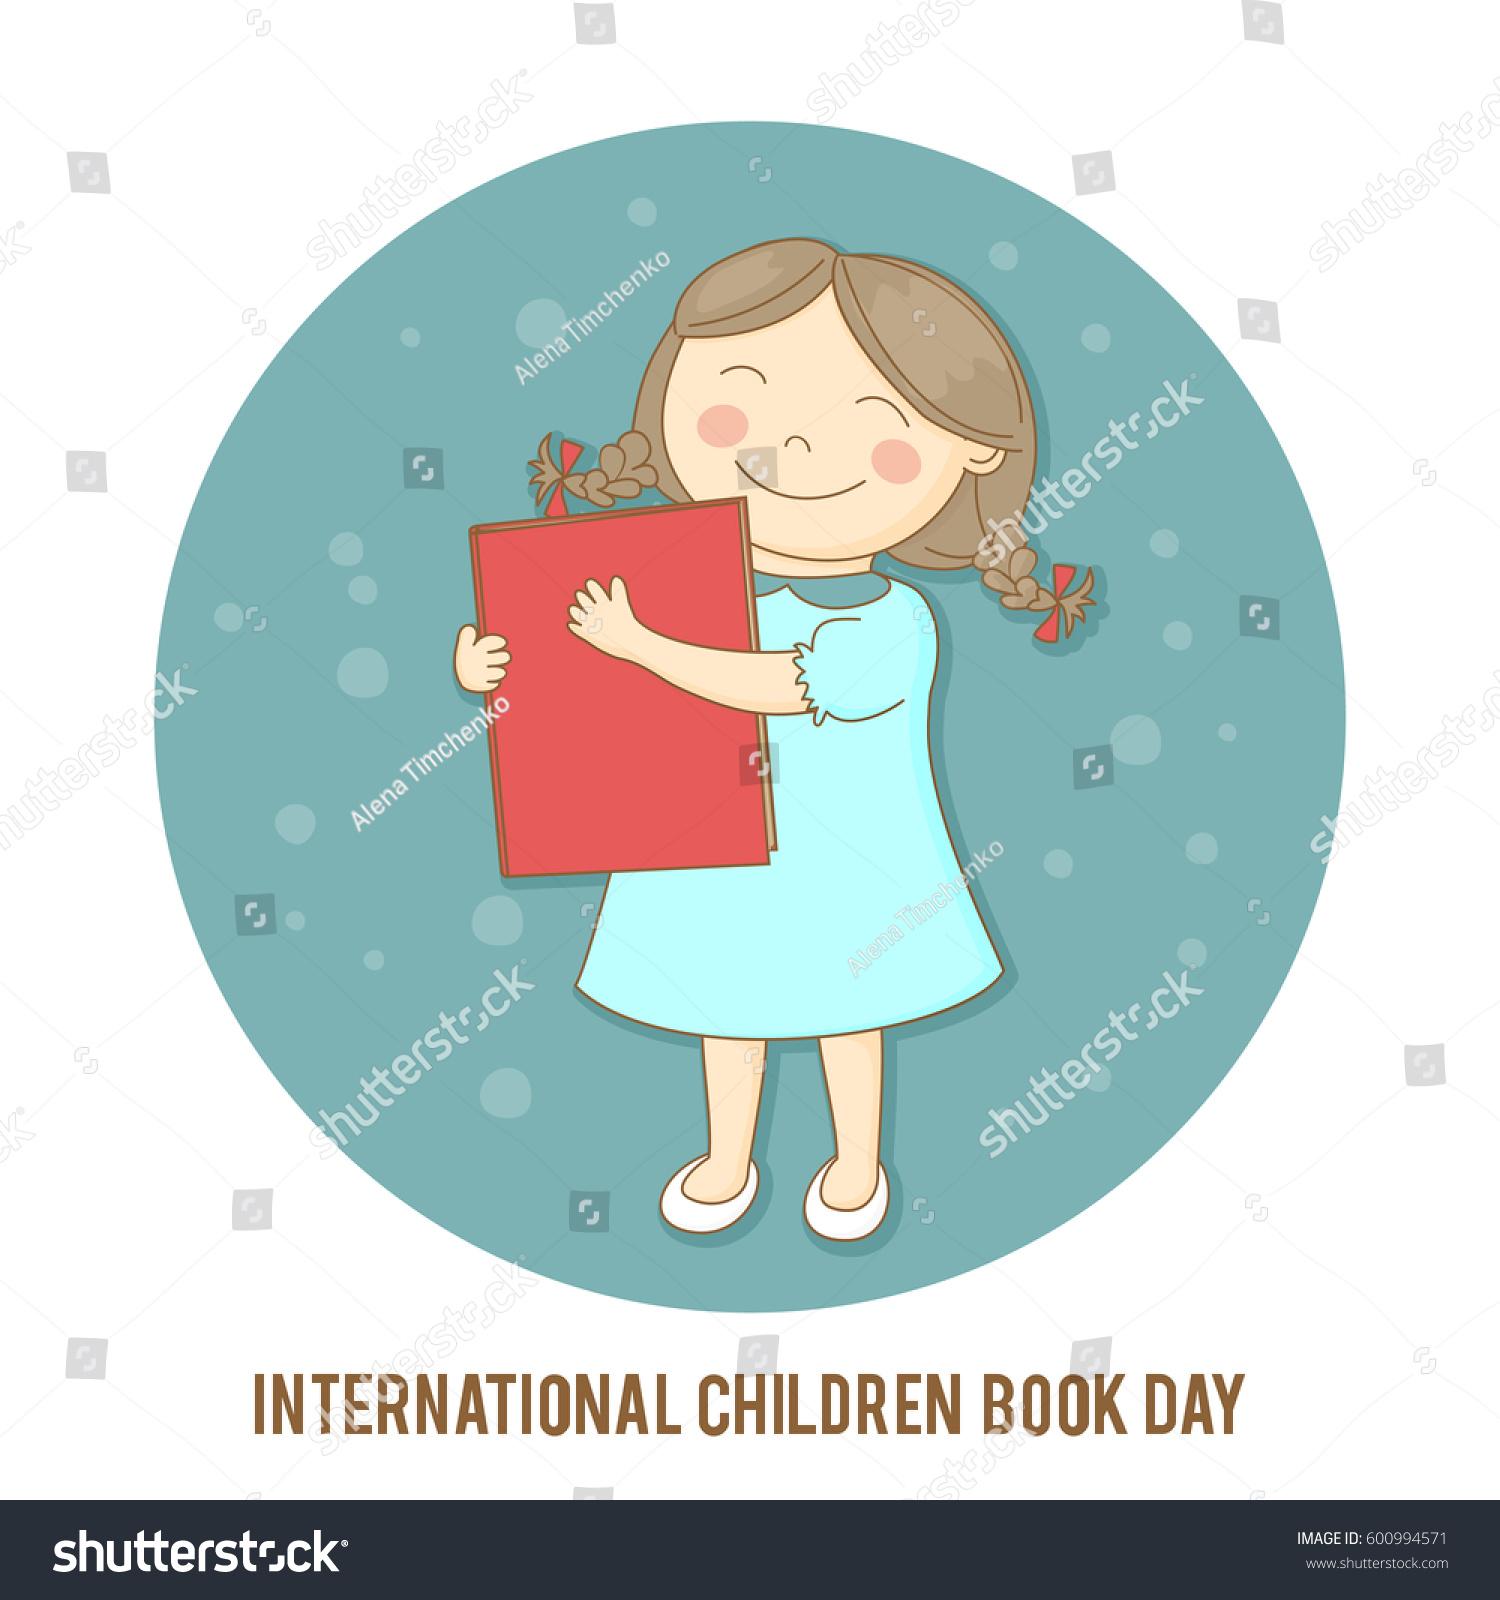 International Children Book Day Vector Illustration Stock ...